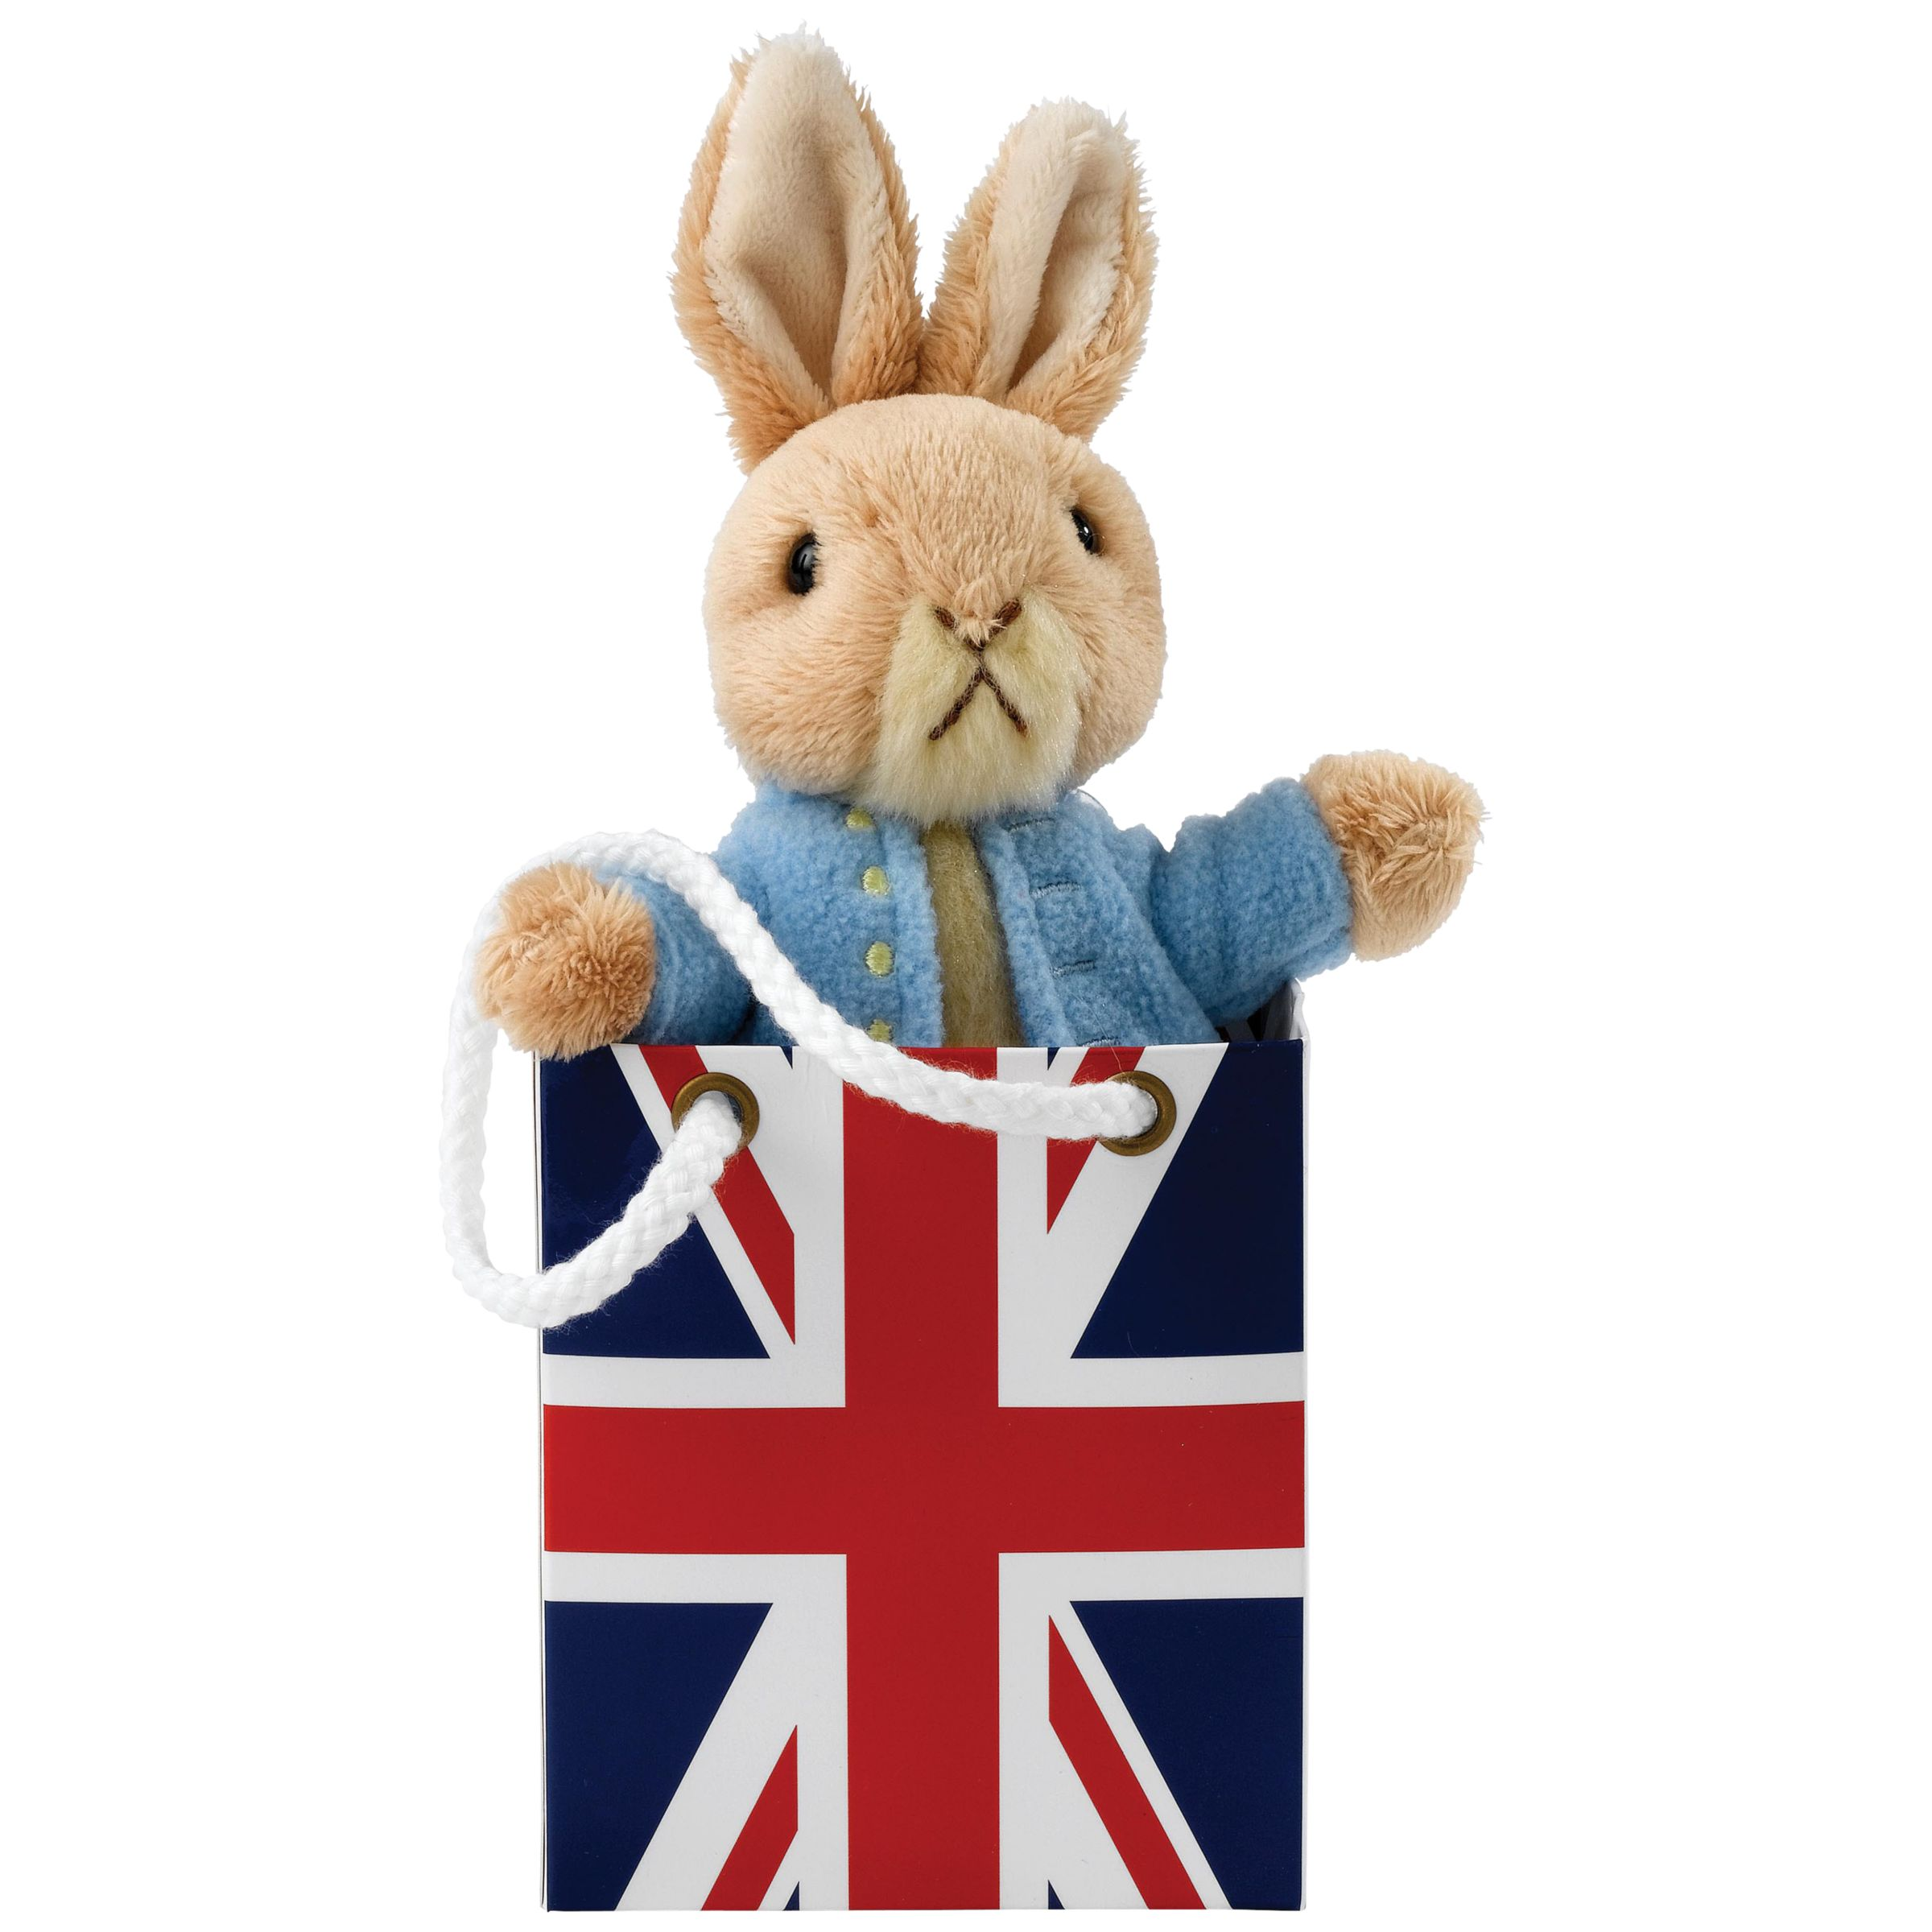 Beatrix Potter Beatrix Potter Peter Rabbit Union Jack Bag Plush Soft Toy Baby Gift